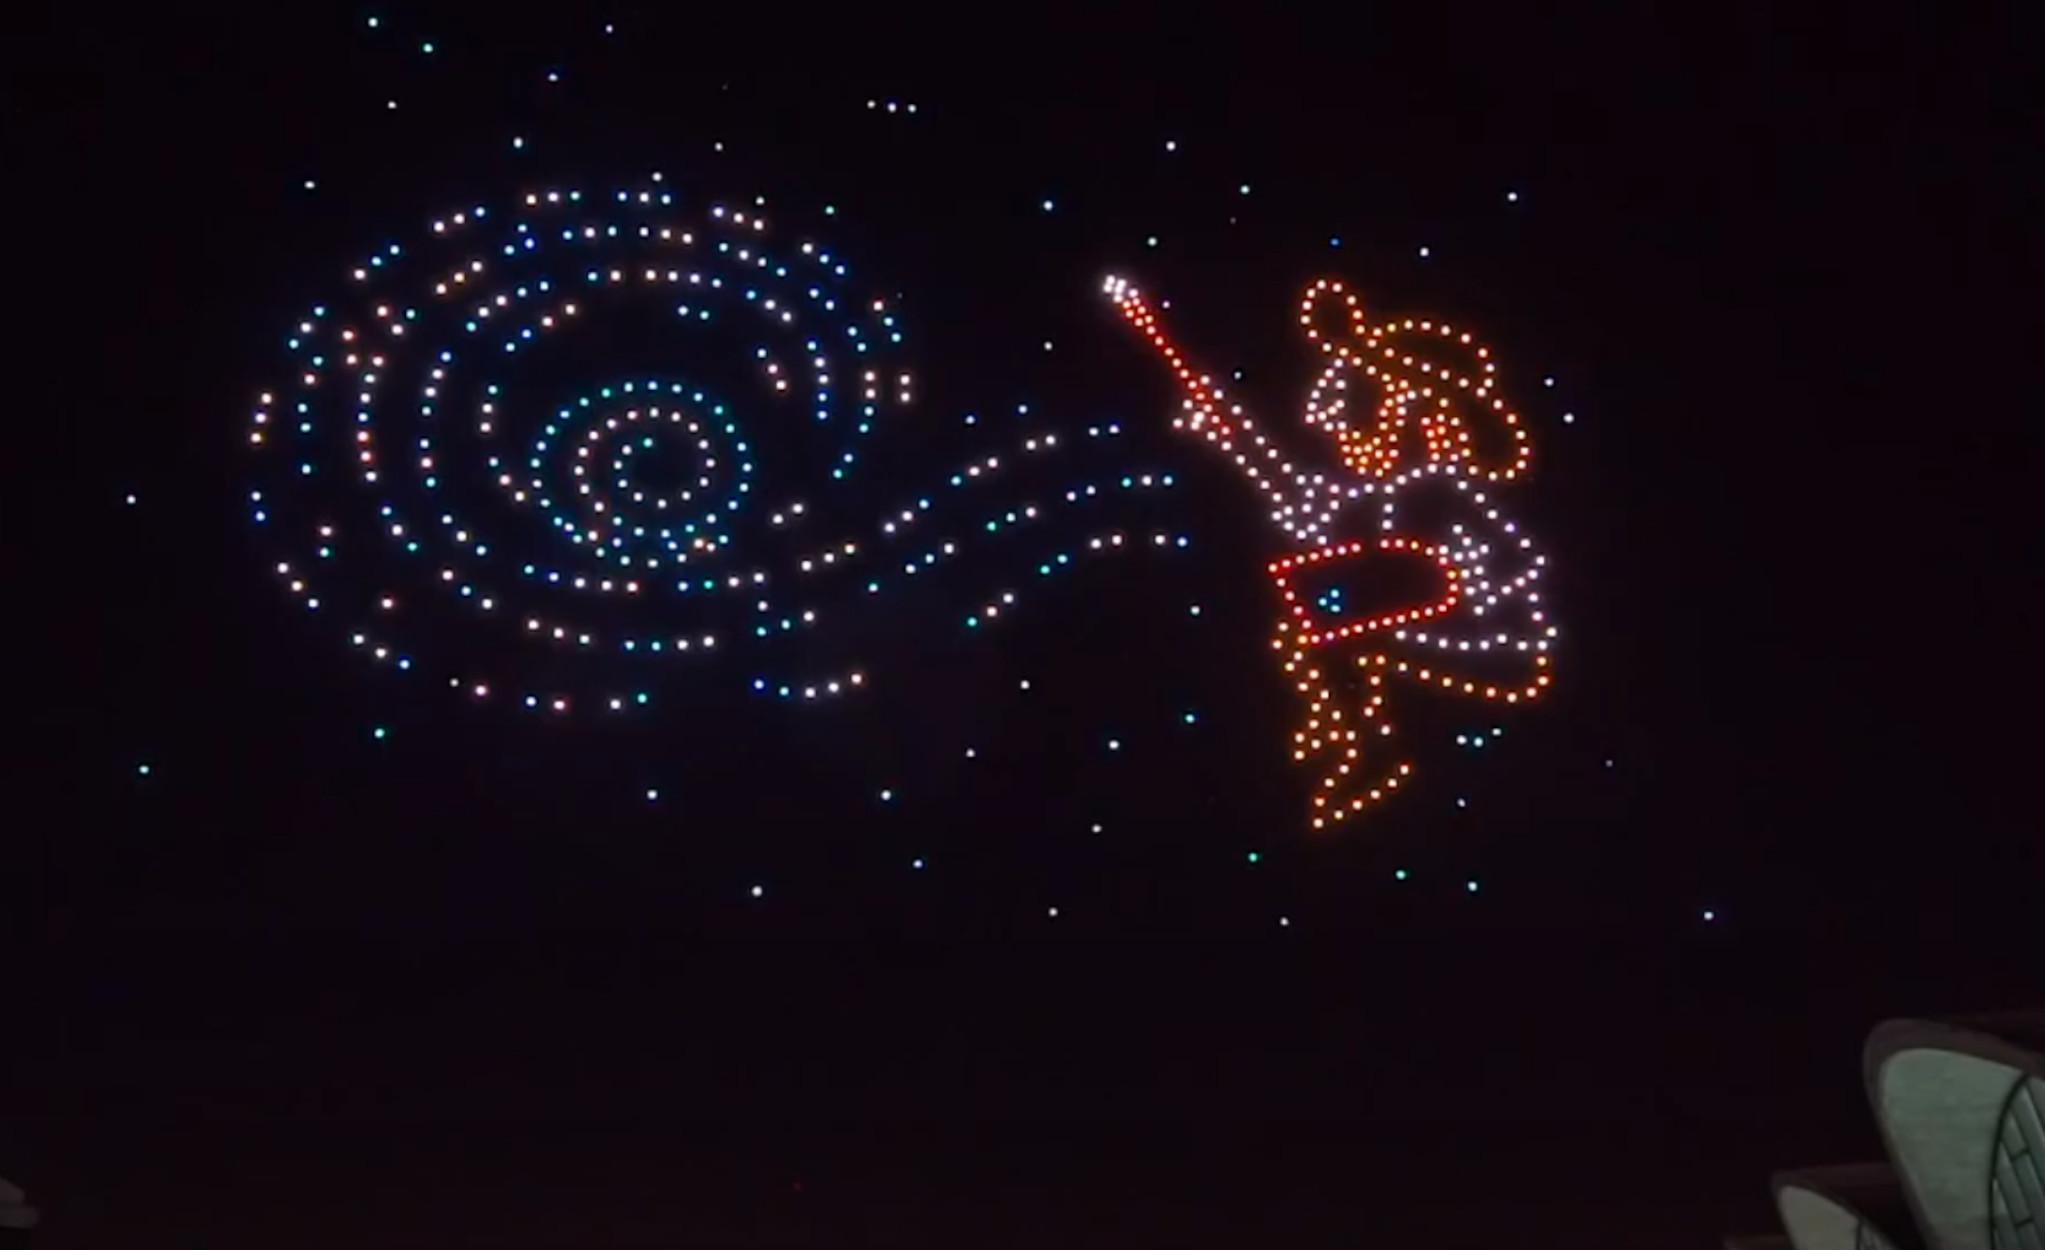 Drones σχημάτισαν πίνακες του Βαν Γκογκ στον ουρανό – Φαντασμαγορικές εικόνες (video)